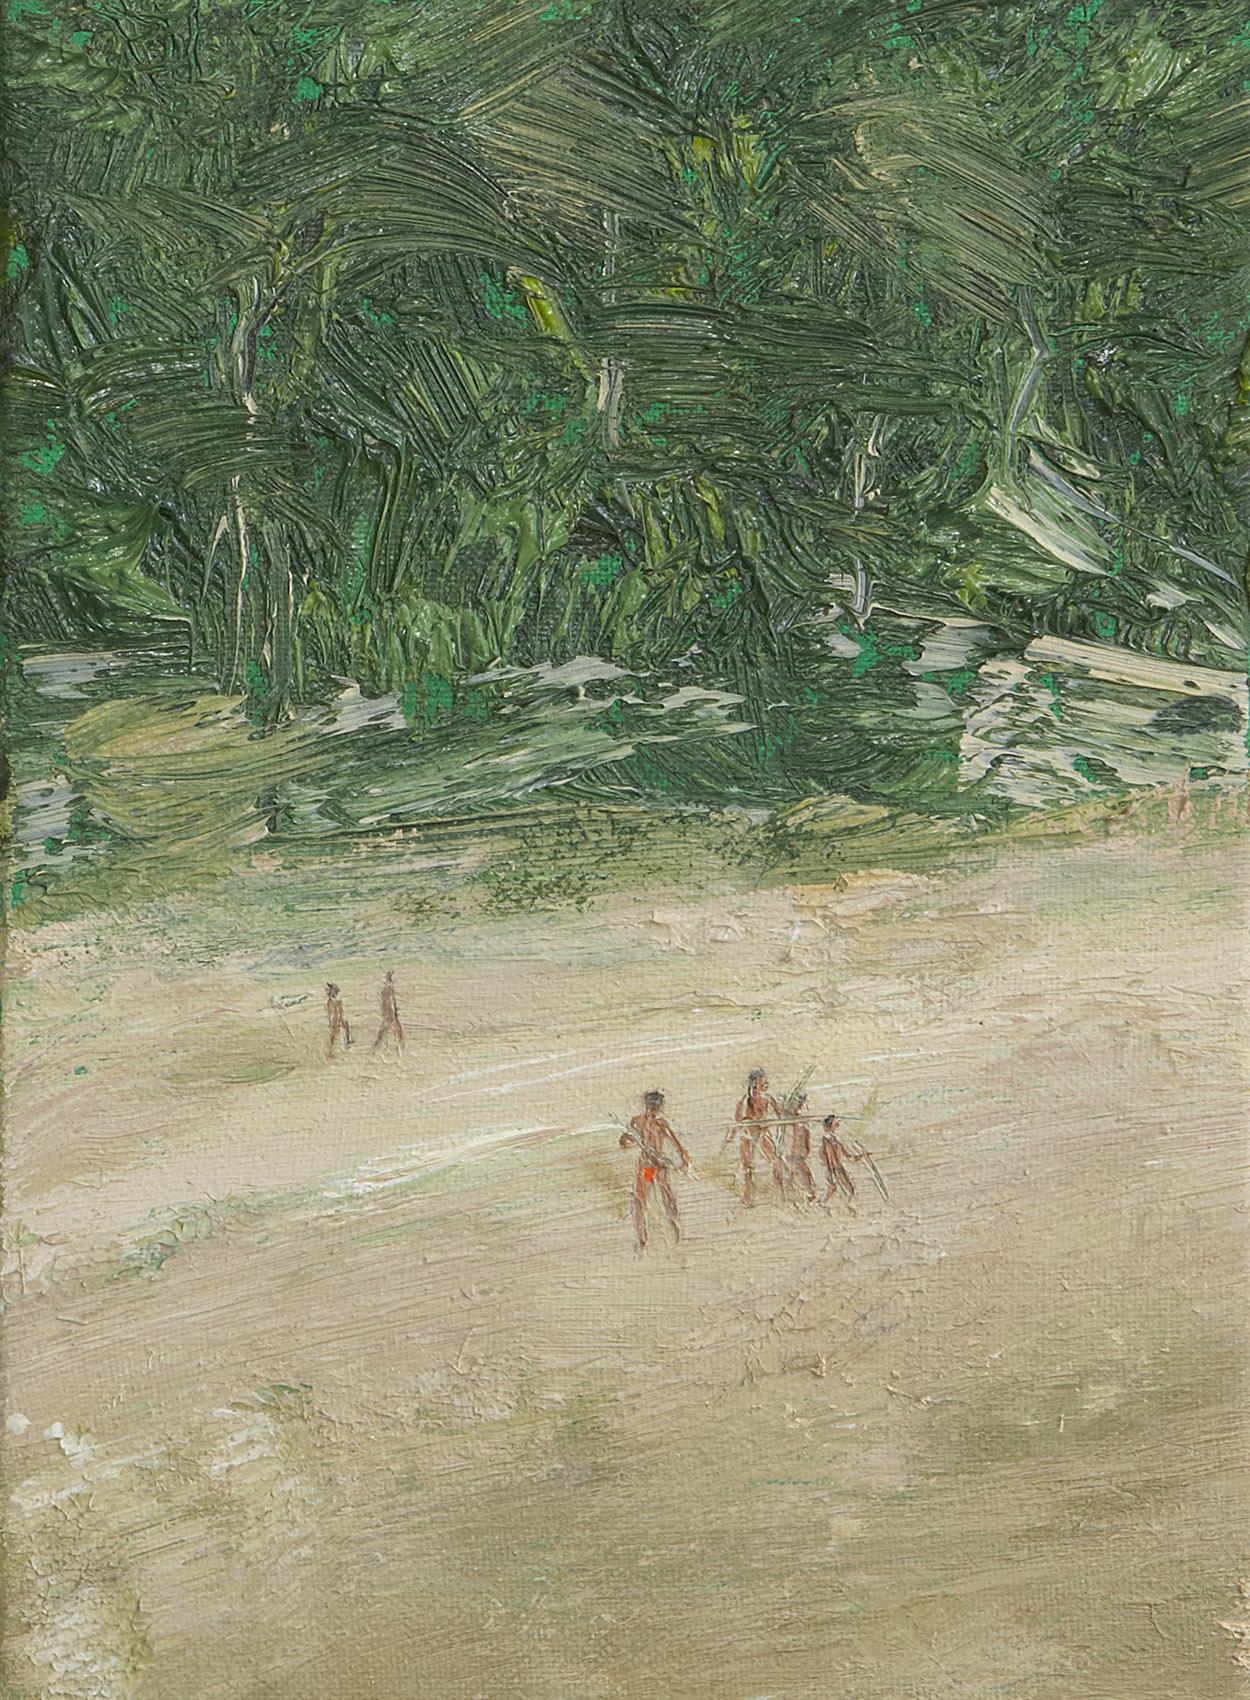 Perú 2010   Oil paint, fluorescent and pigment on canvas. 16 x 22 cm.